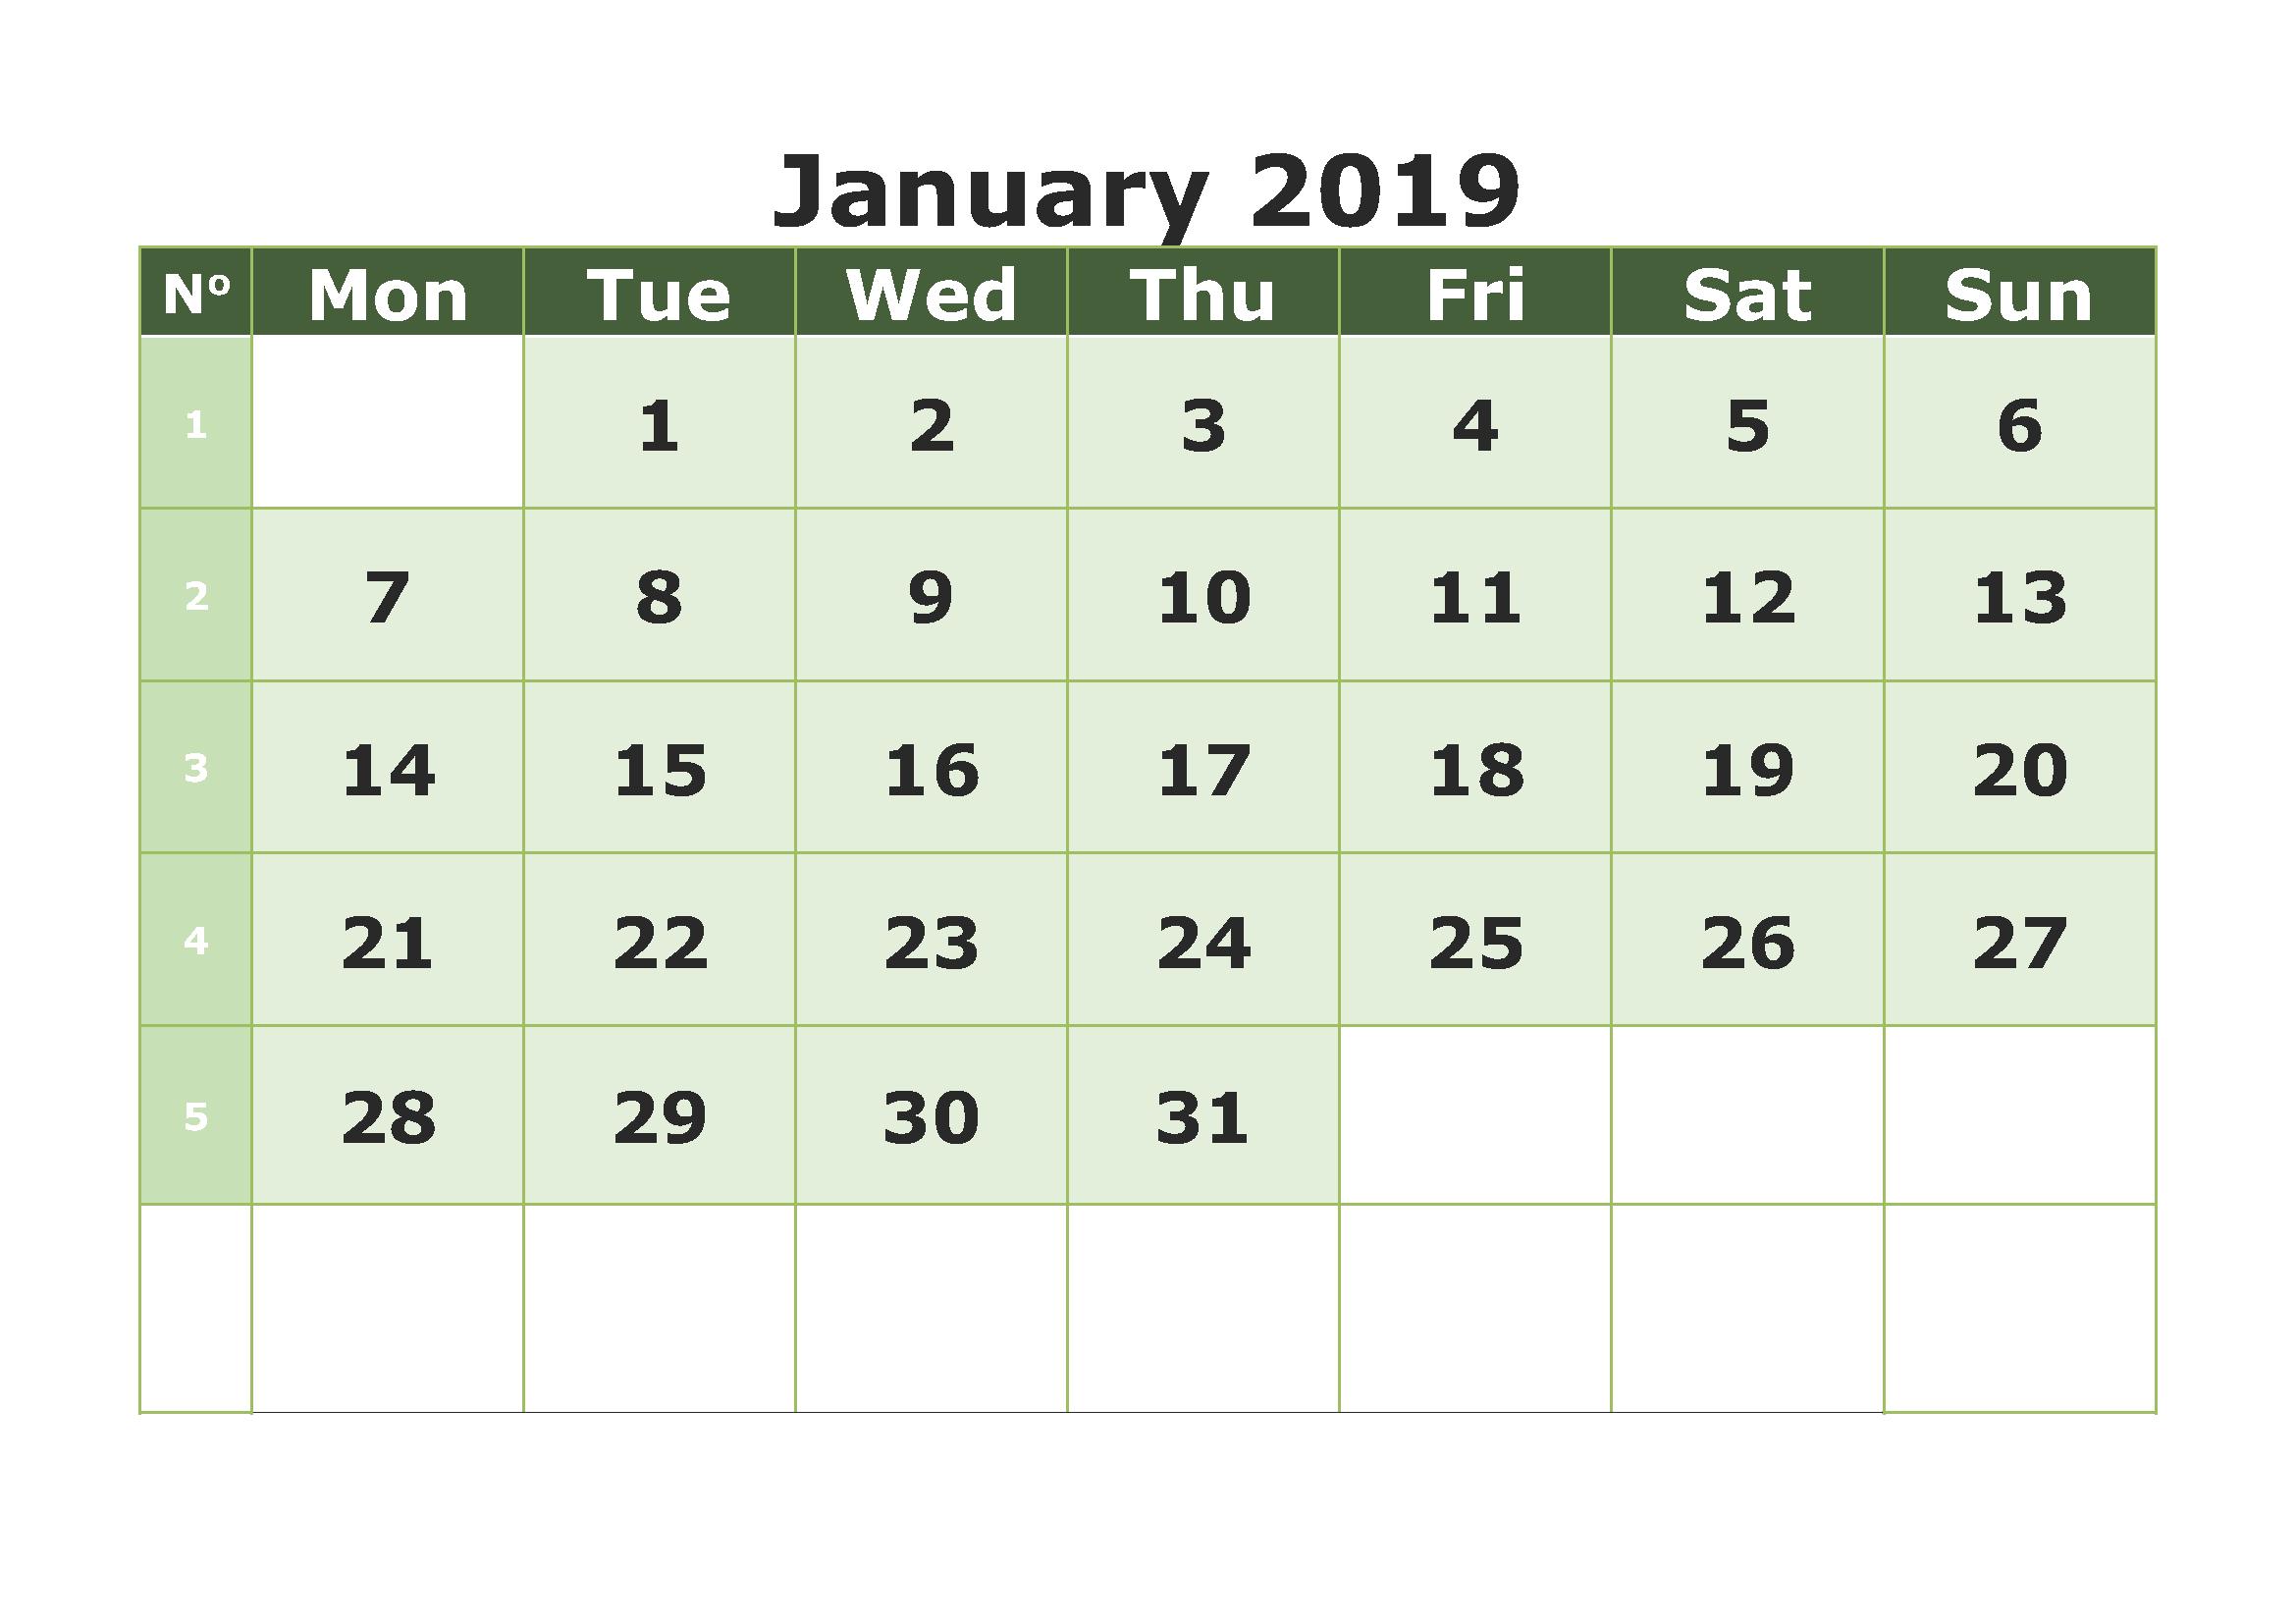 January 2019 Calendar Template Printable